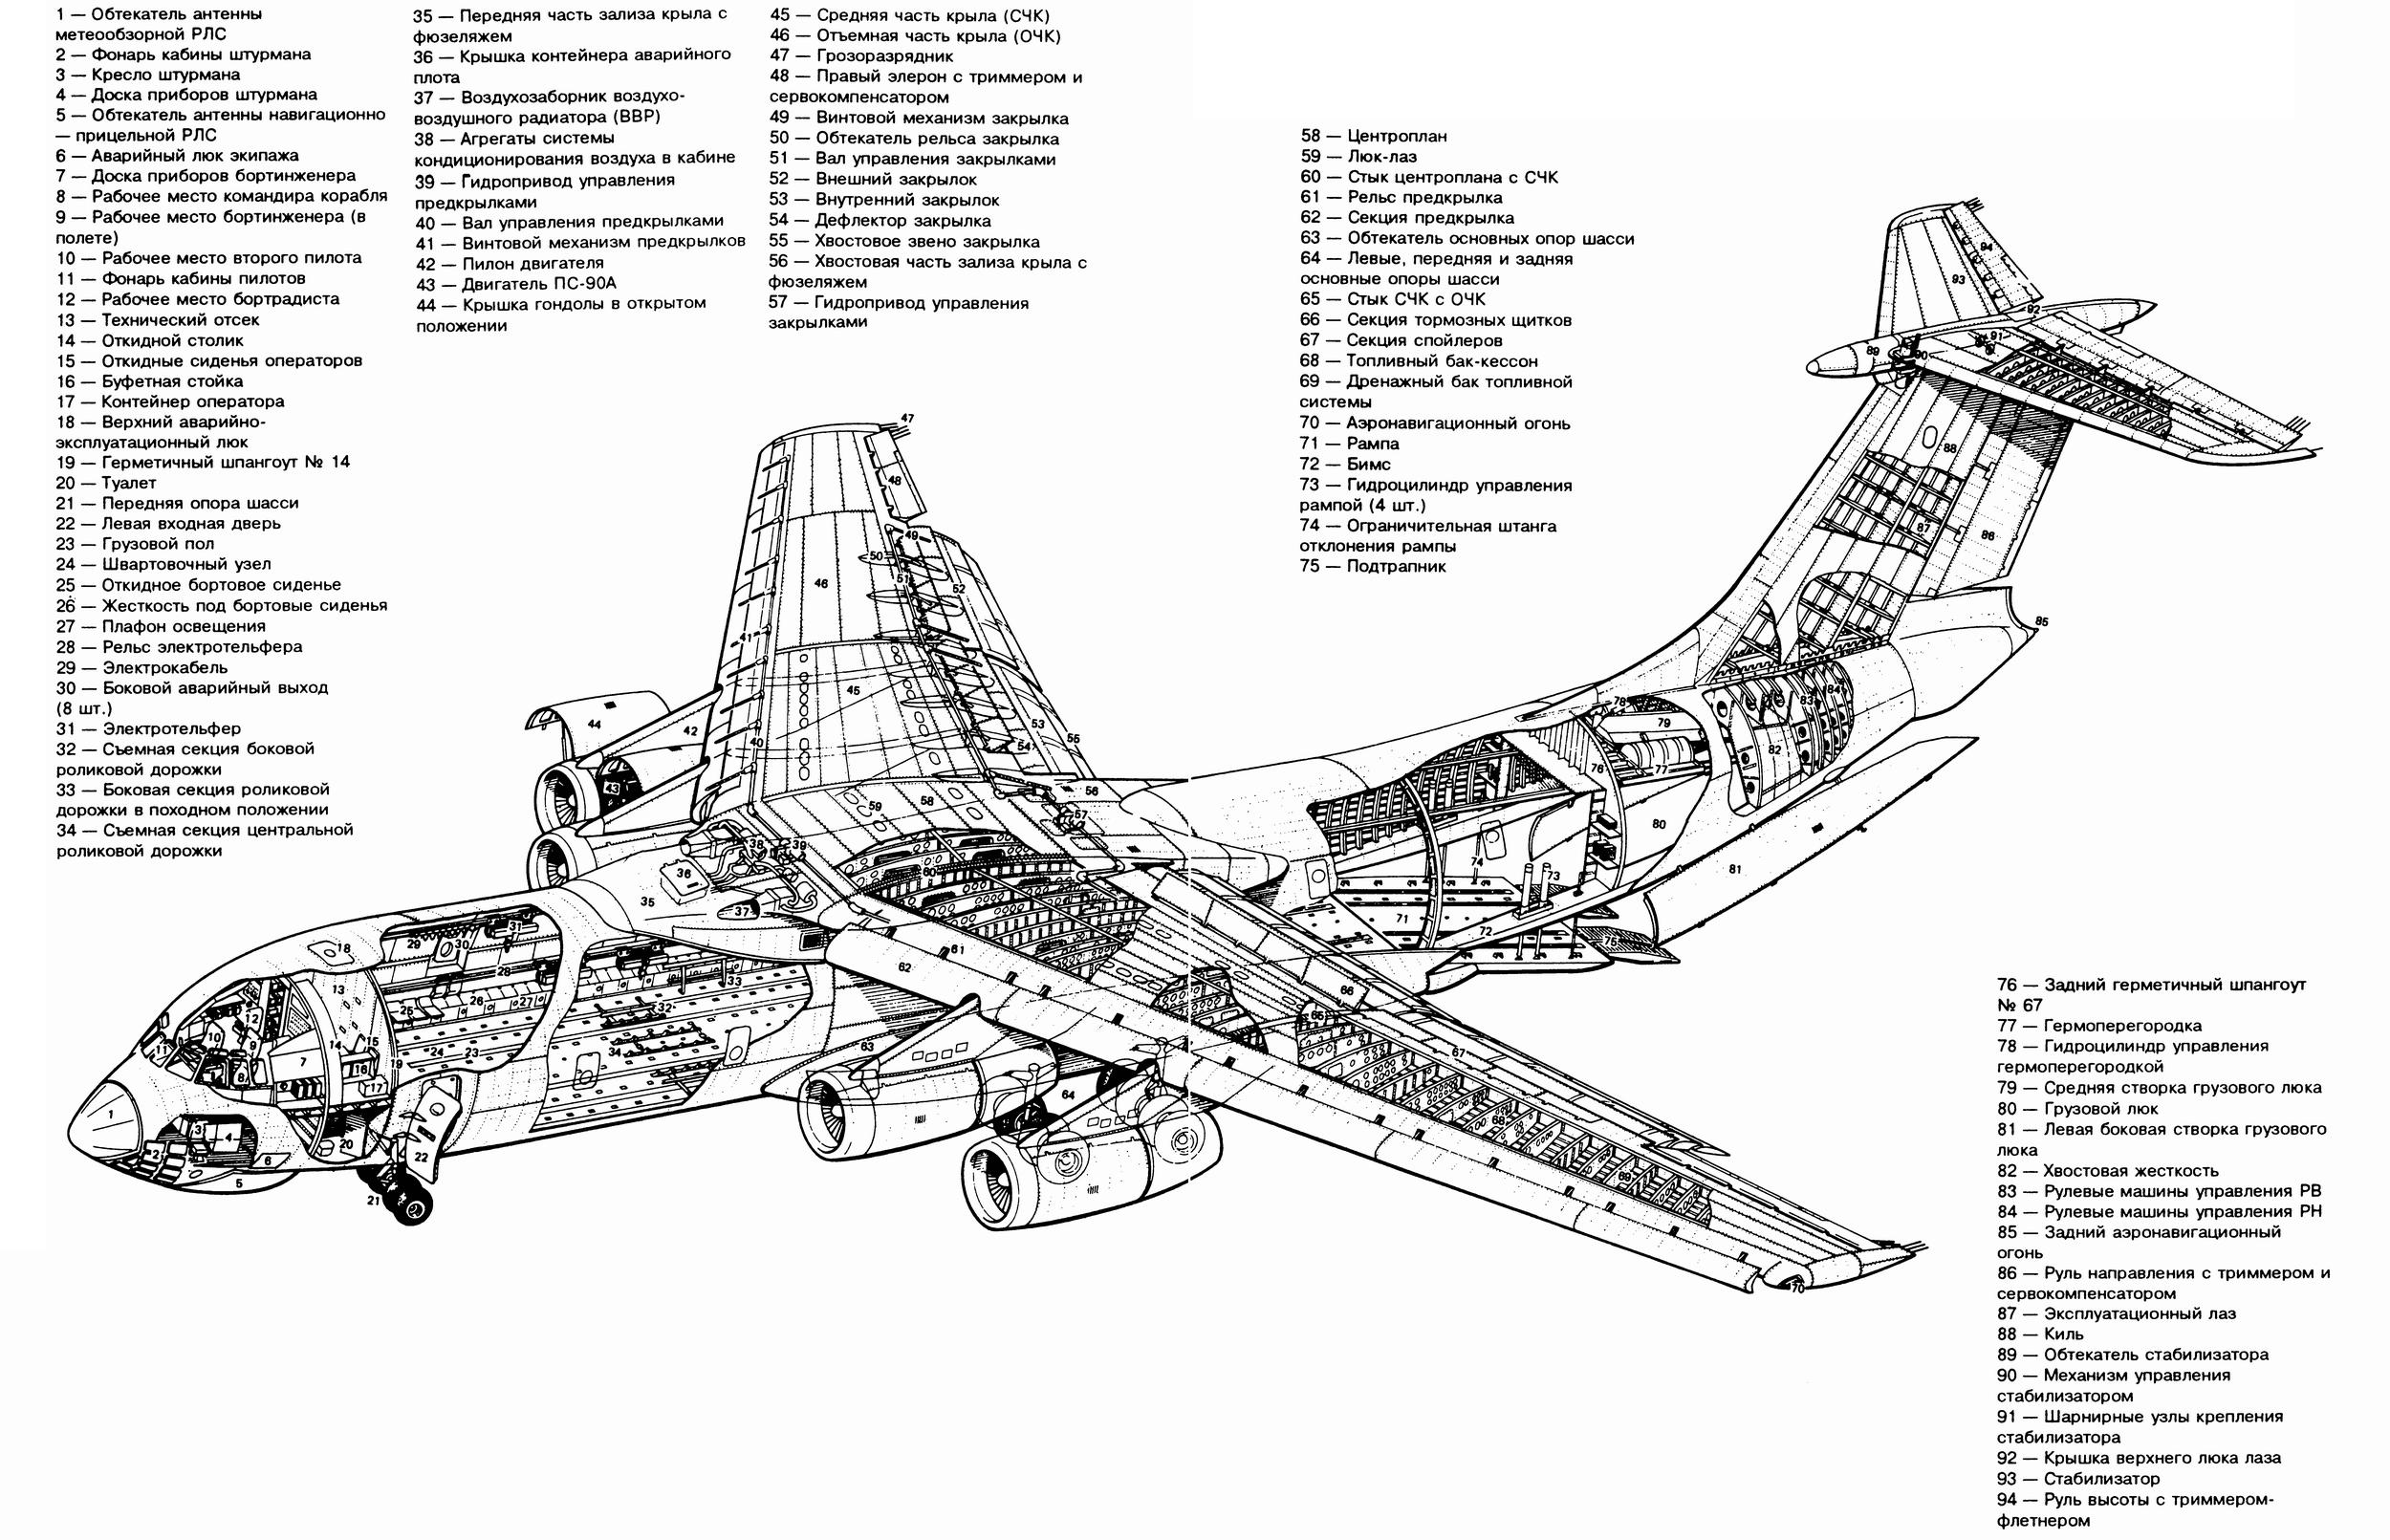 Разрез военно-транспортного самолёта ИЛ-76.